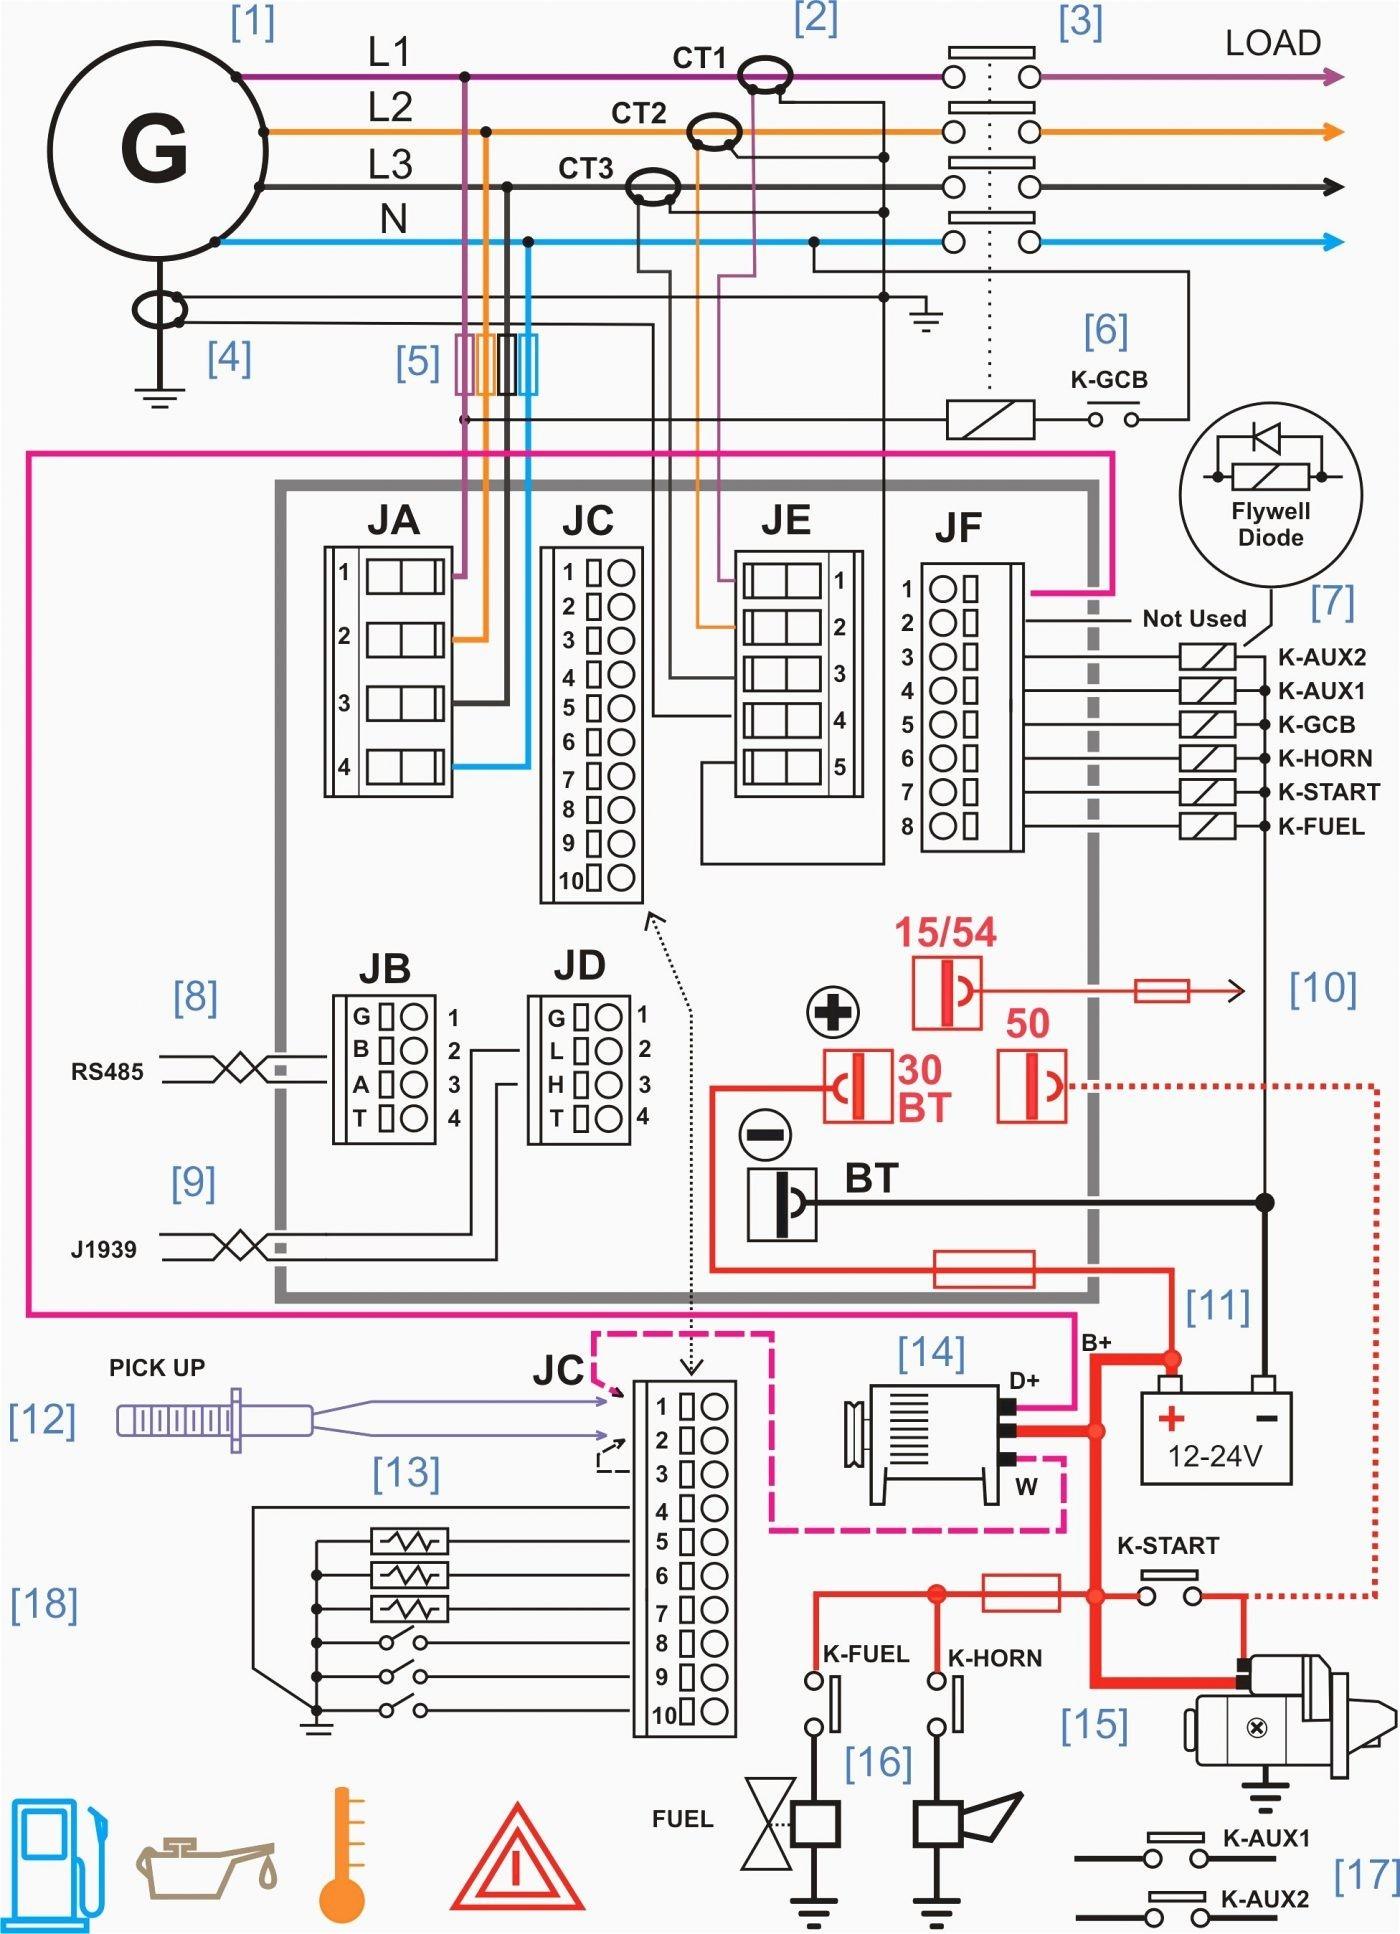 hight resolution of dodge ram 1500 parts diagram dodge ram oem parts diagram of dodge ram 1500 parts diagram